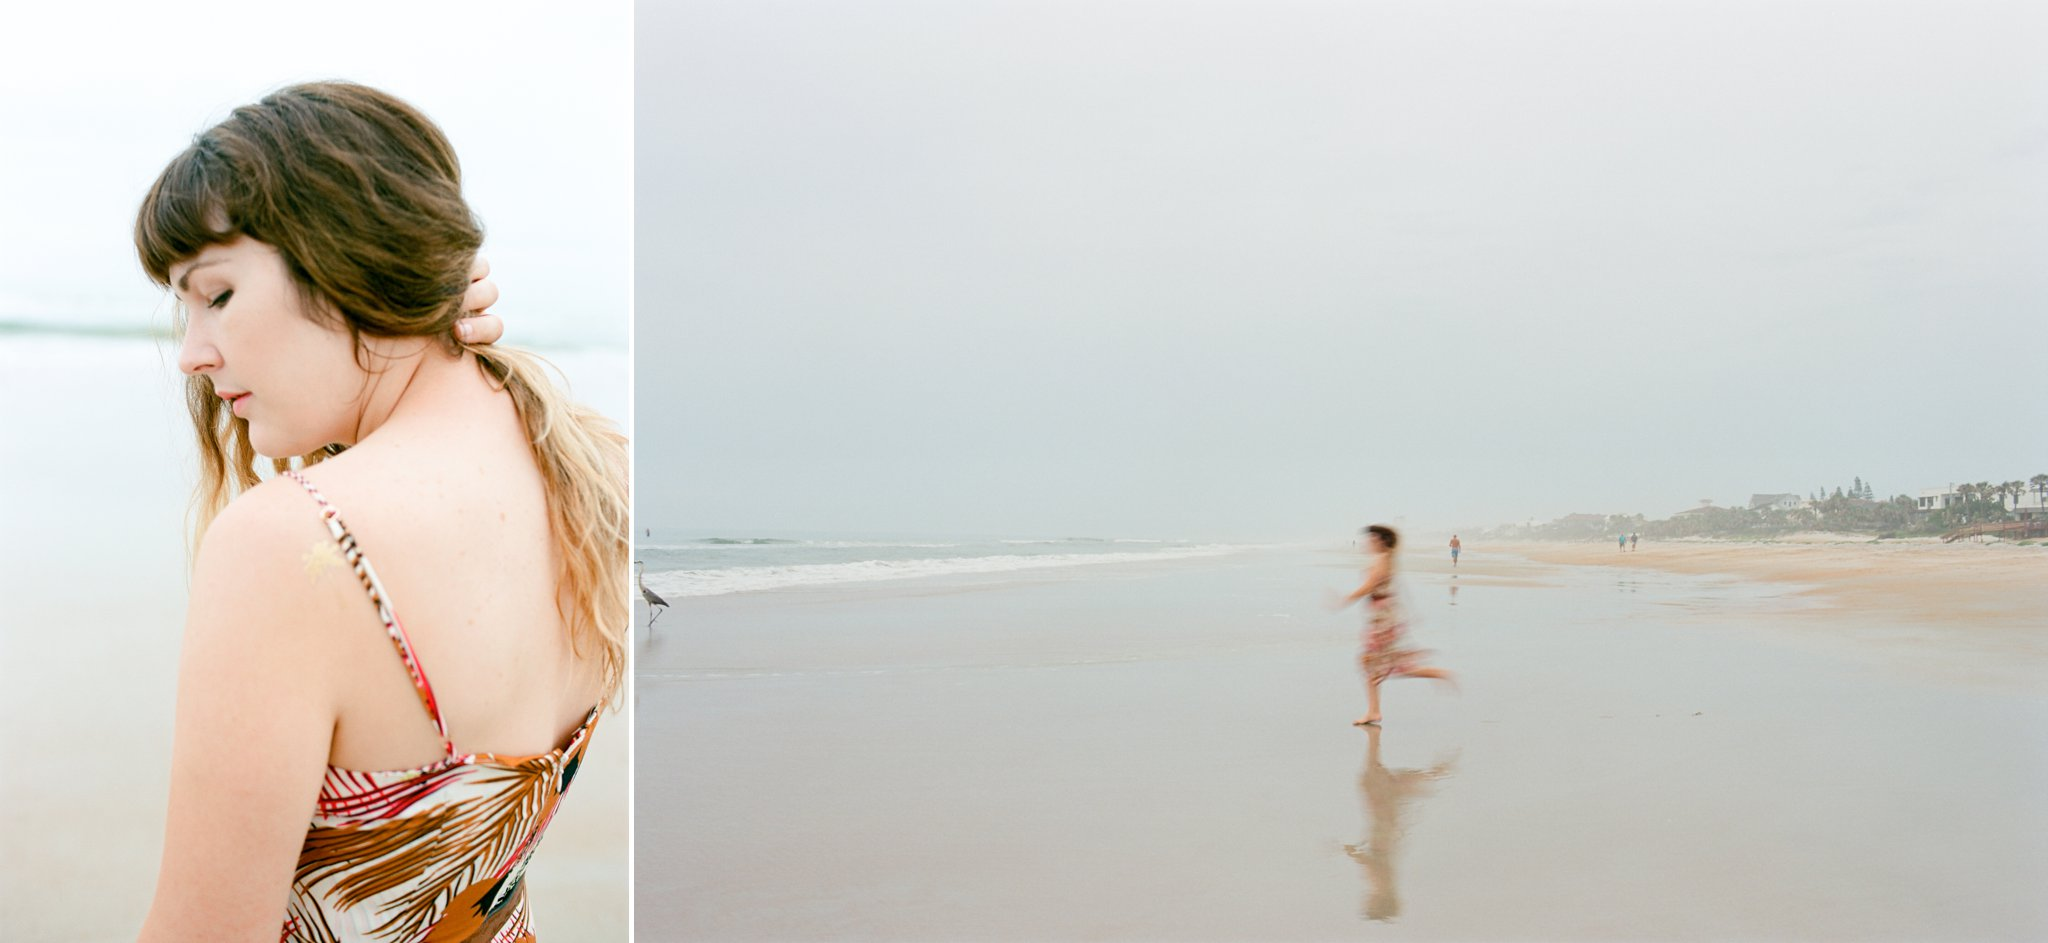 west palm beach branding photographer west palm beach headshot photographer shannon griffin photography_0010.jpg